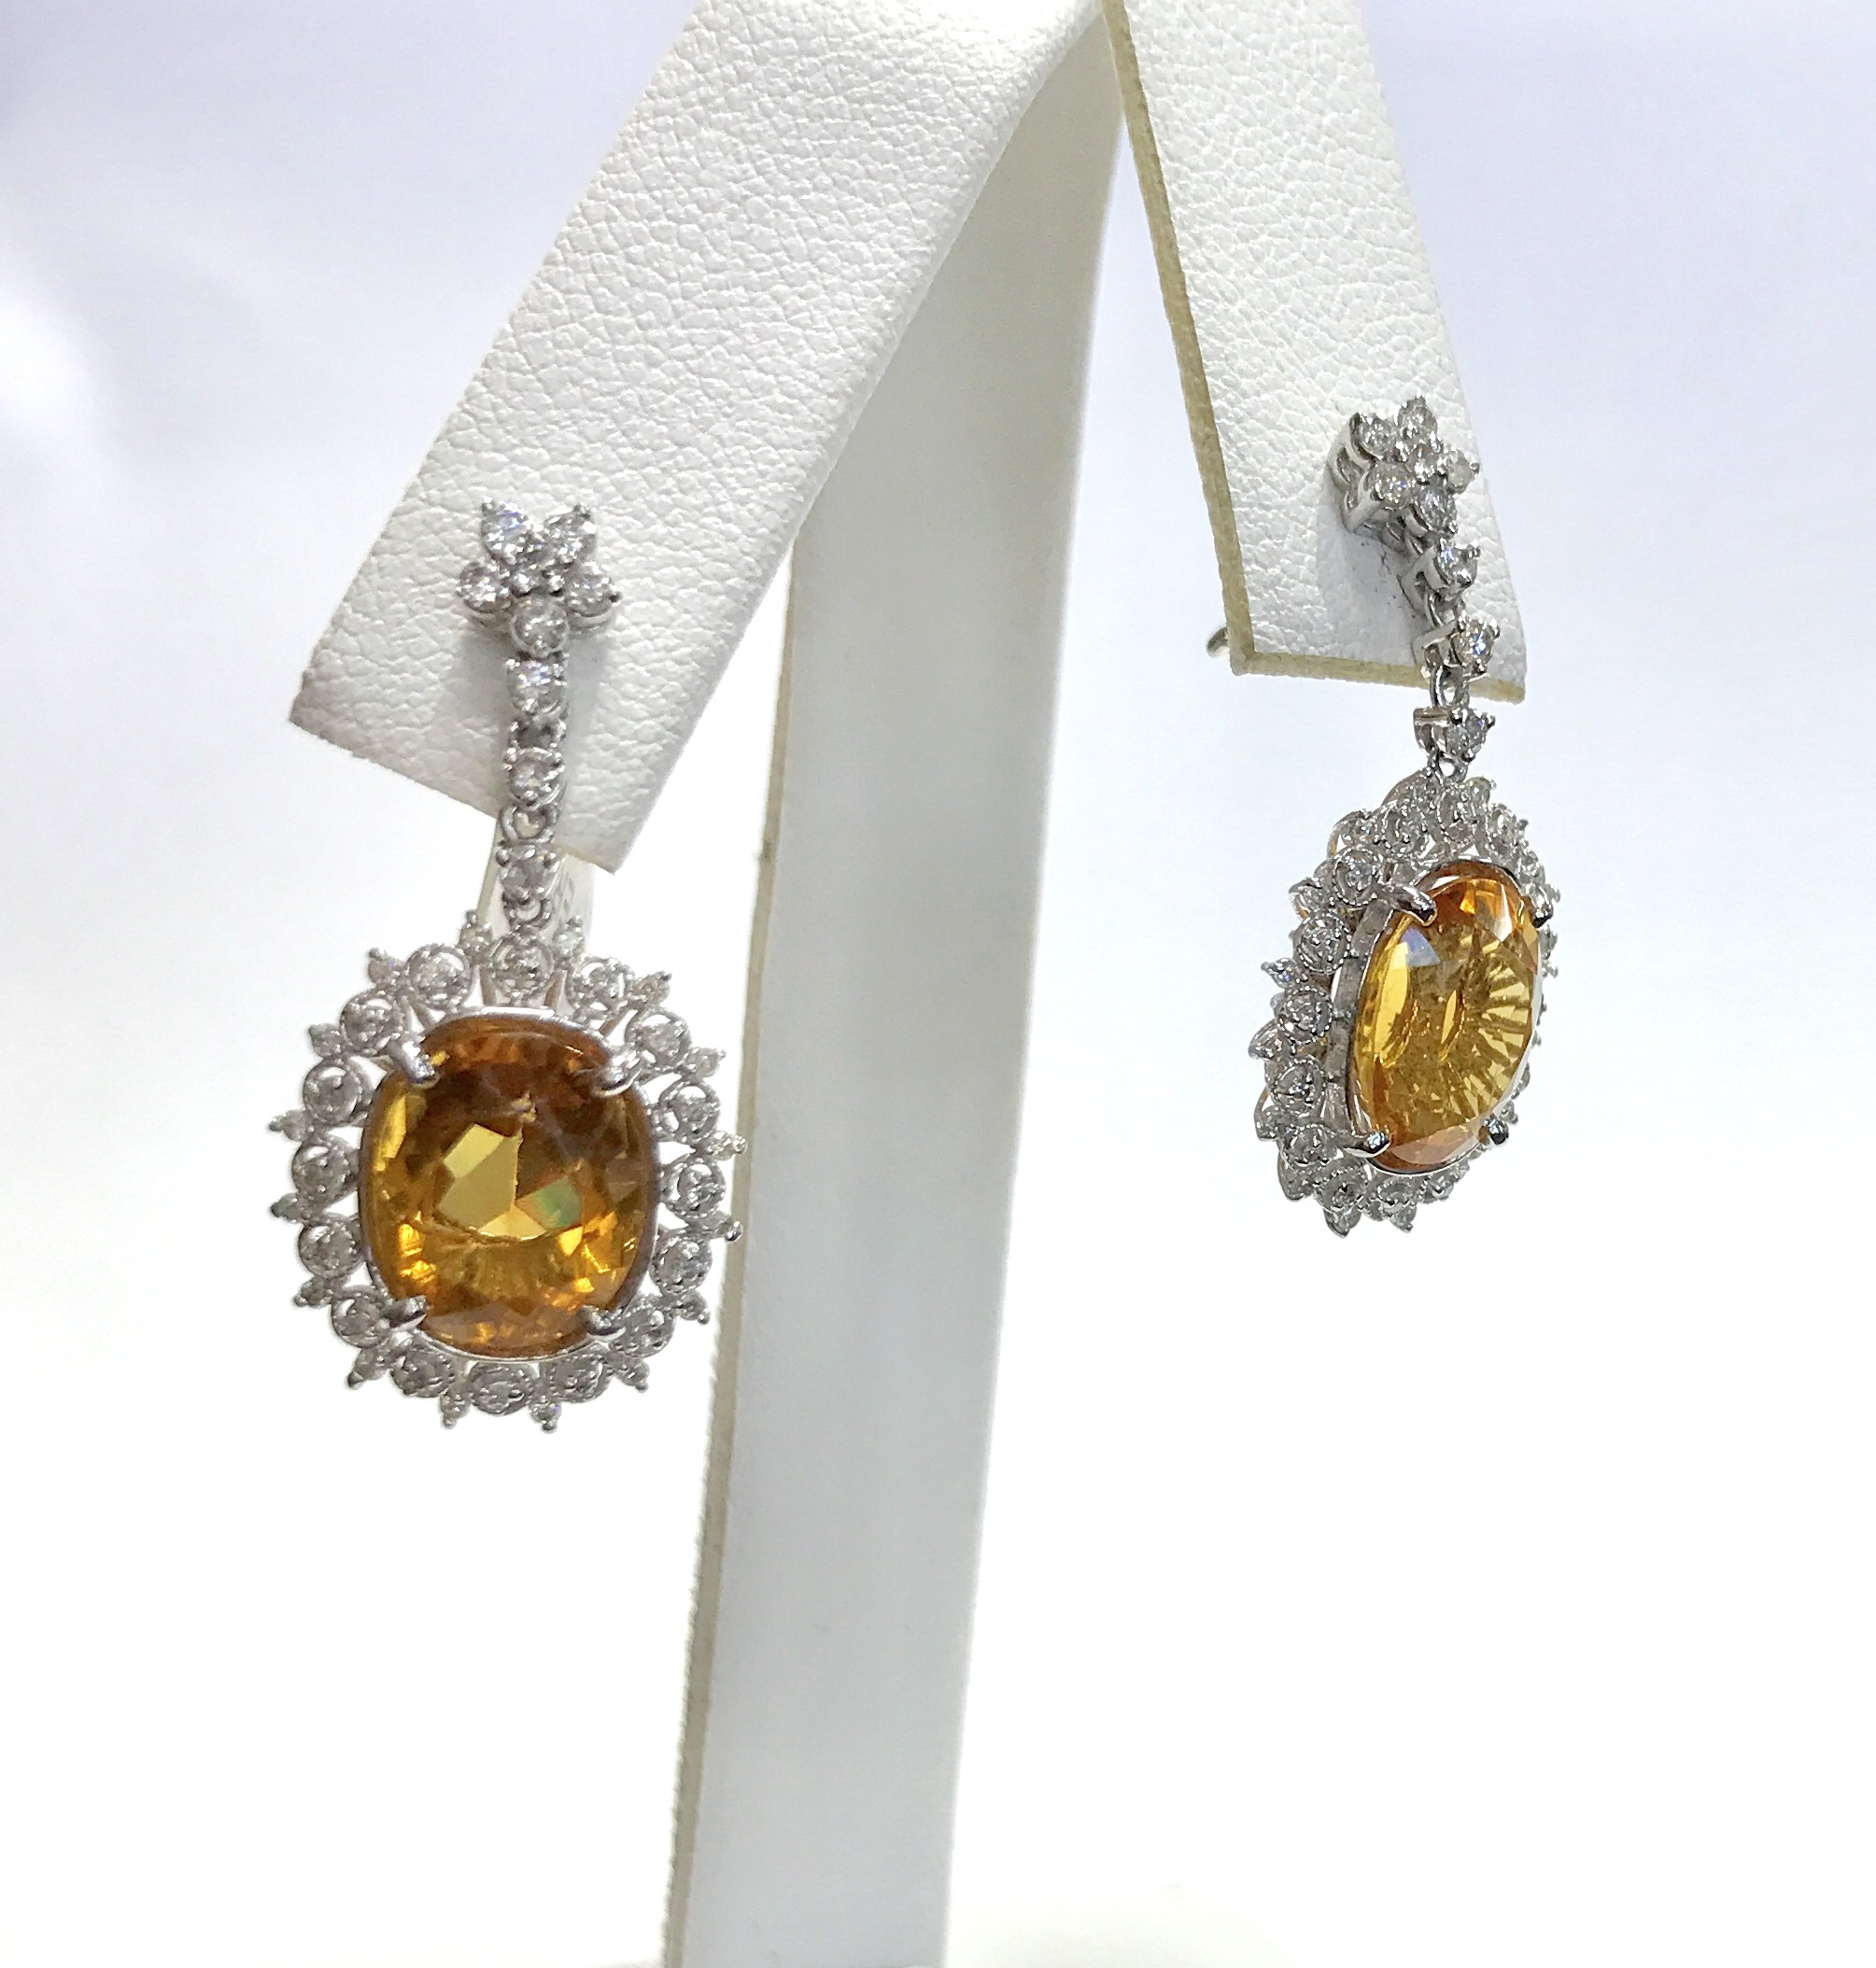 Irvine Gold Mine | Anaheim Hills Jewelry and Coin –